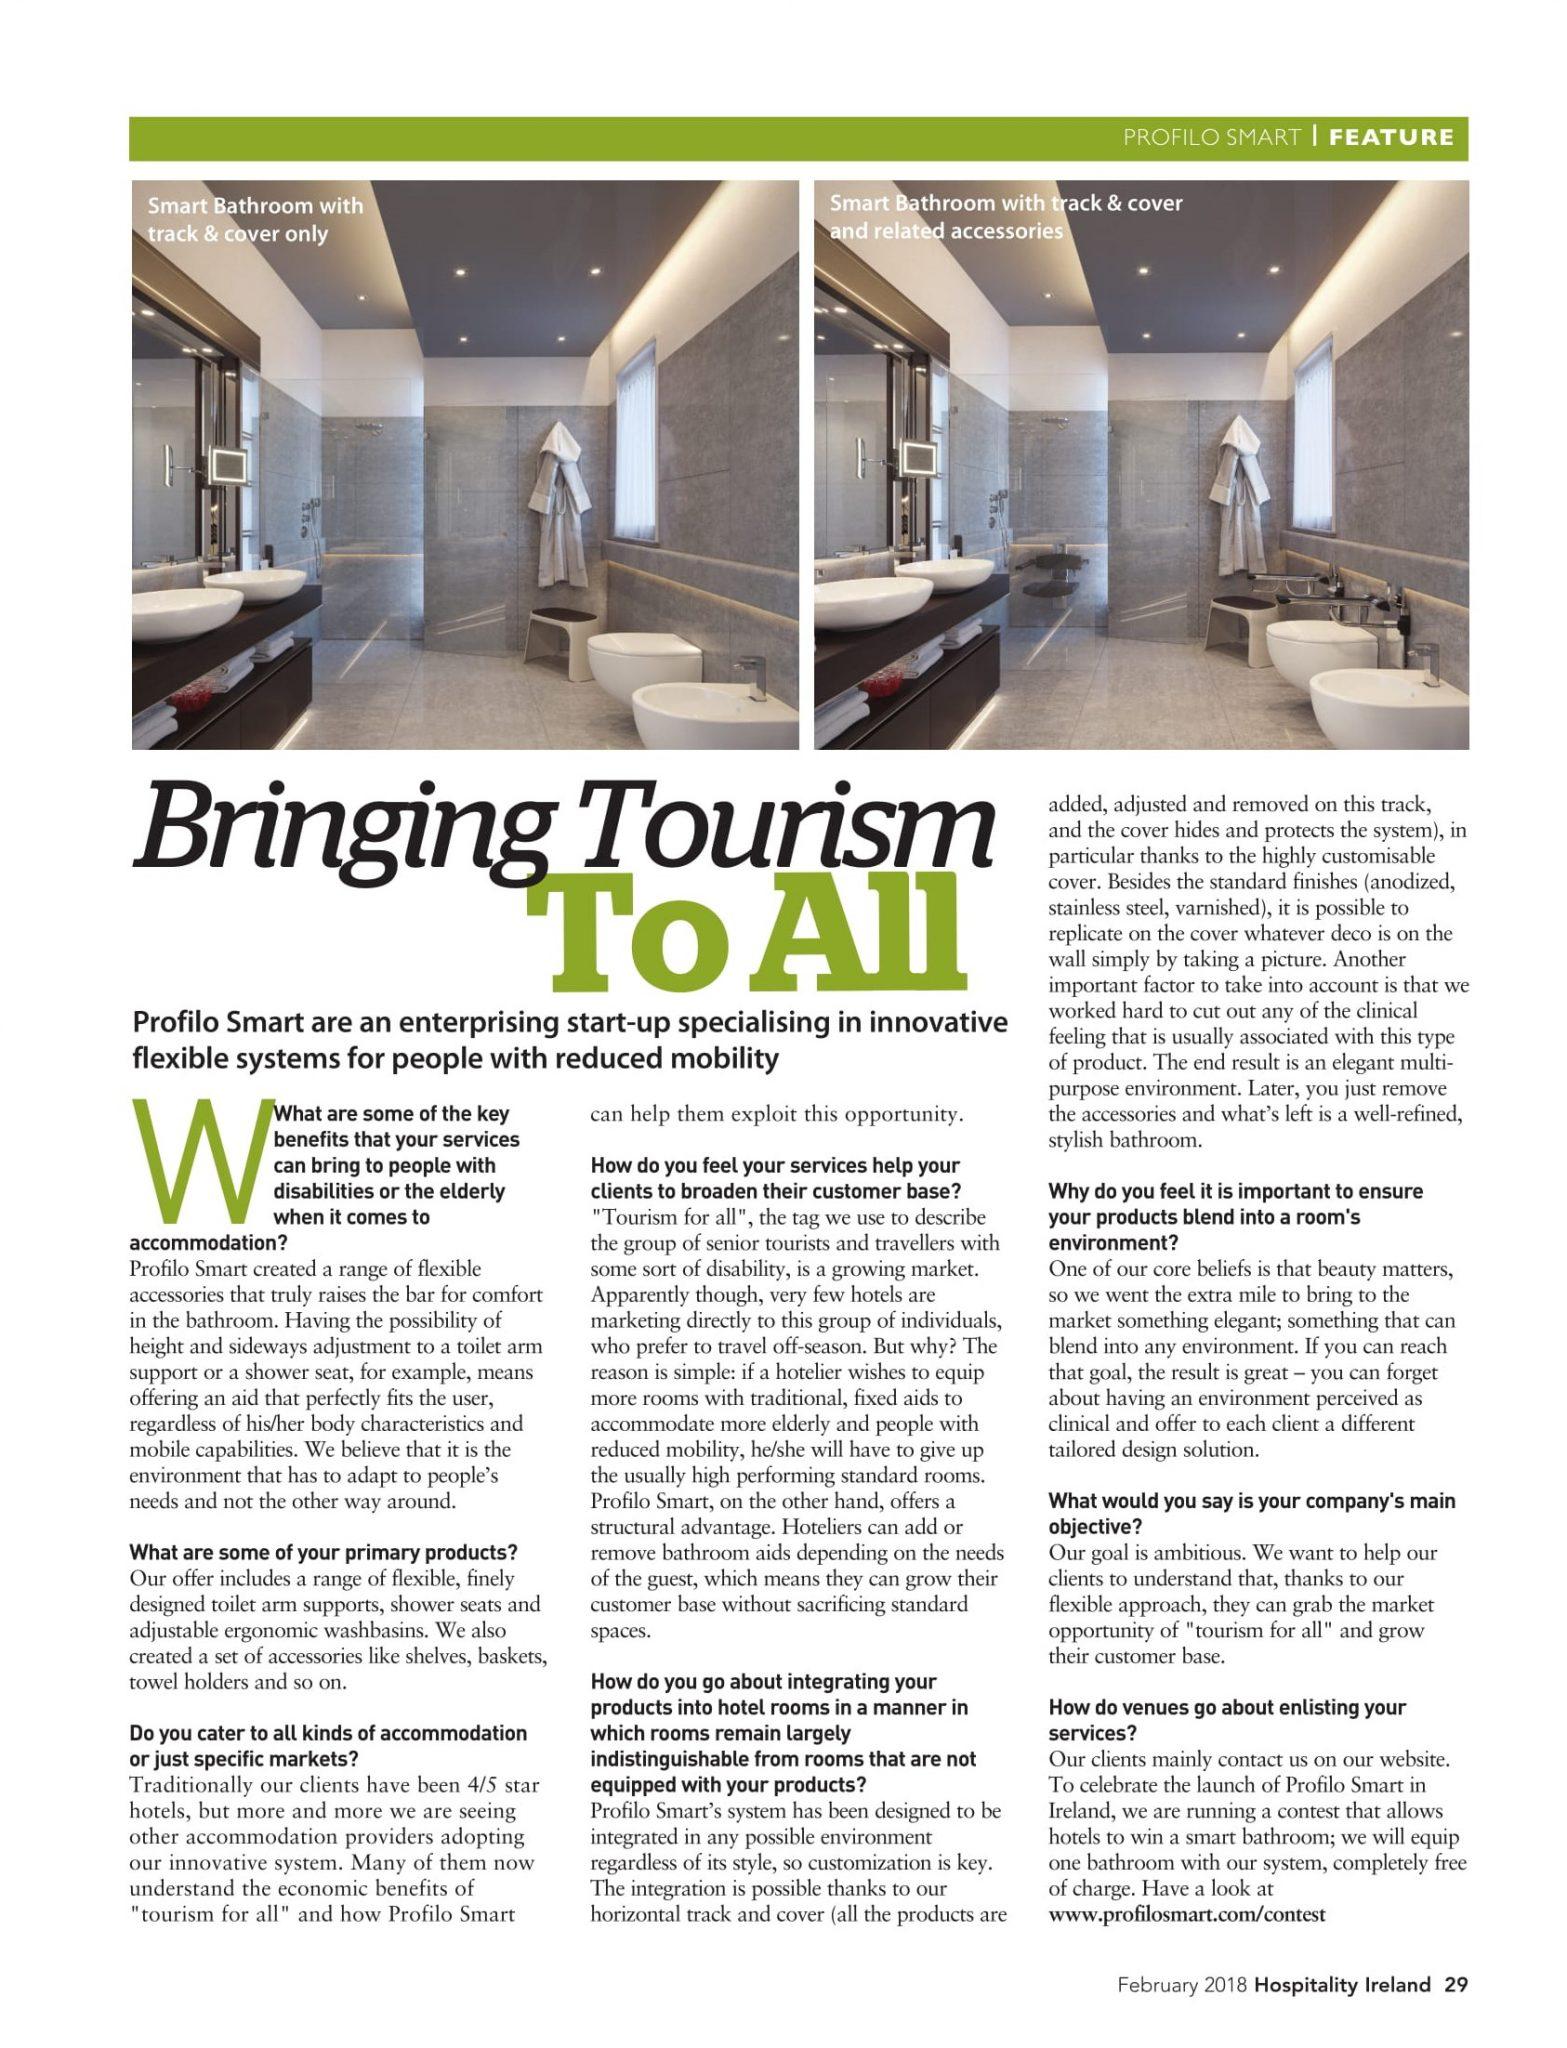 PROFILO SMART, accessible bathrooms, accessible rooms, Universal Design